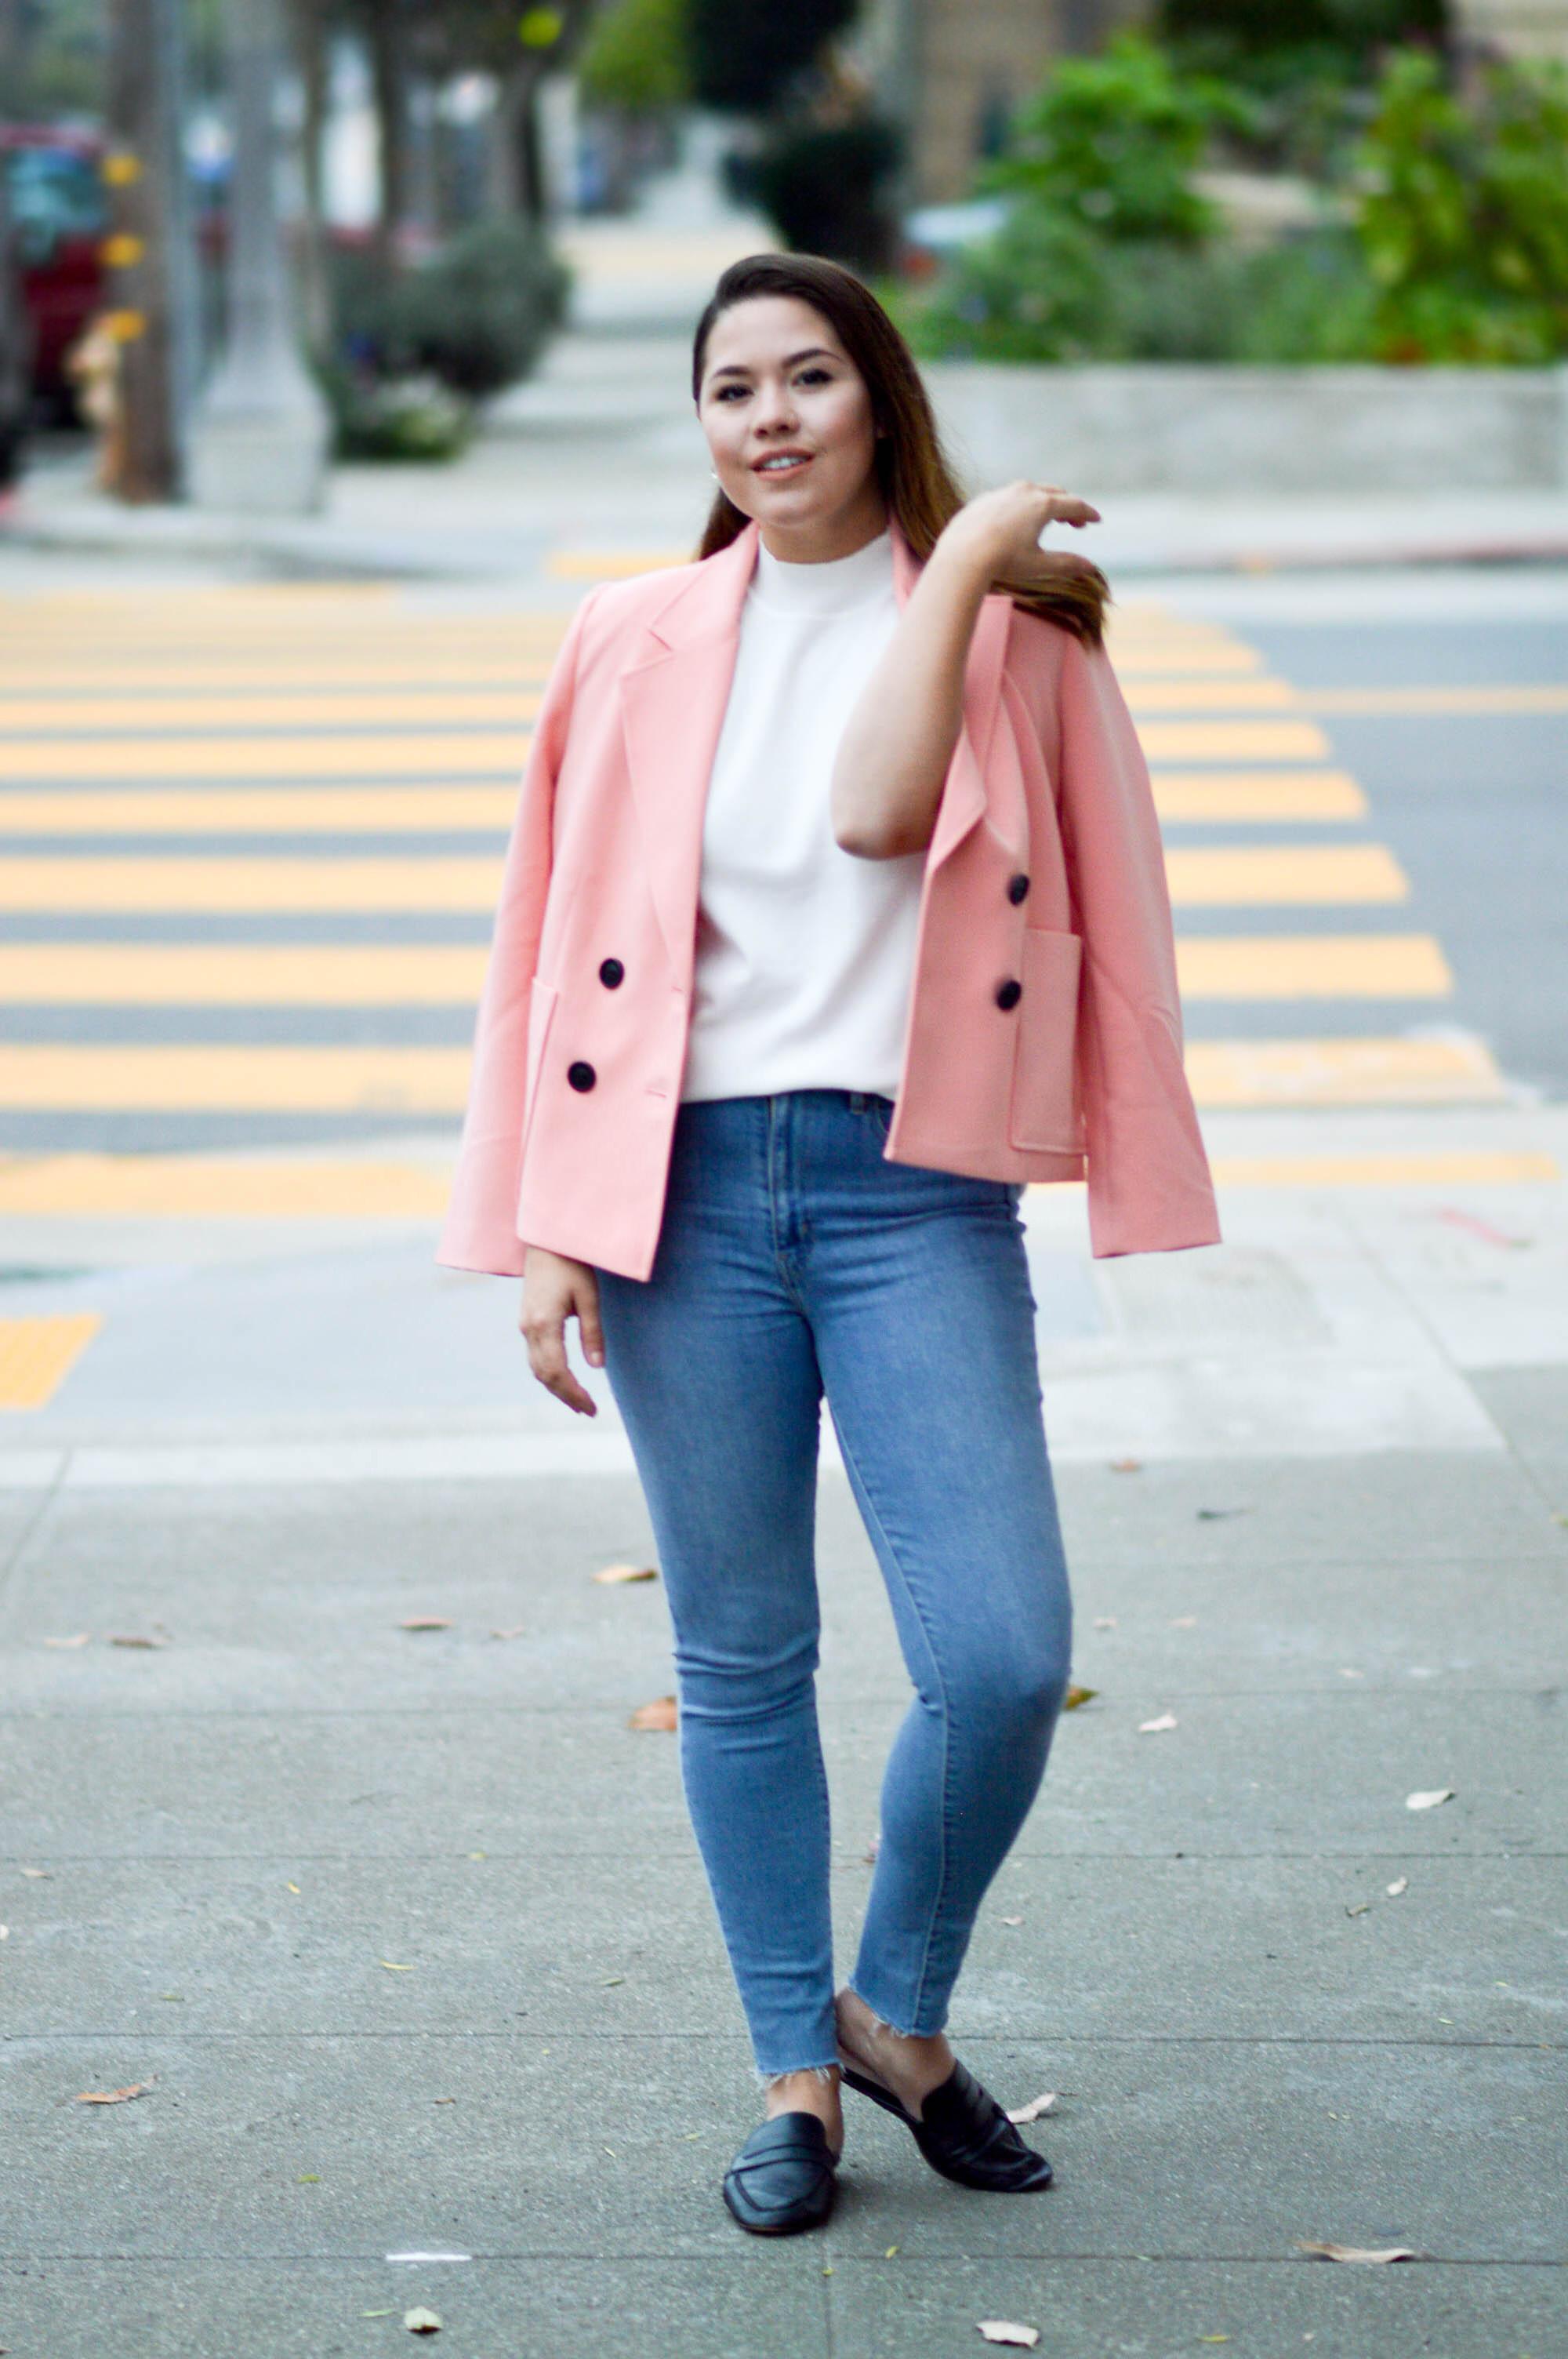 Pink Pastel Jacket and white turtleneck via. www.birdieshoots.com